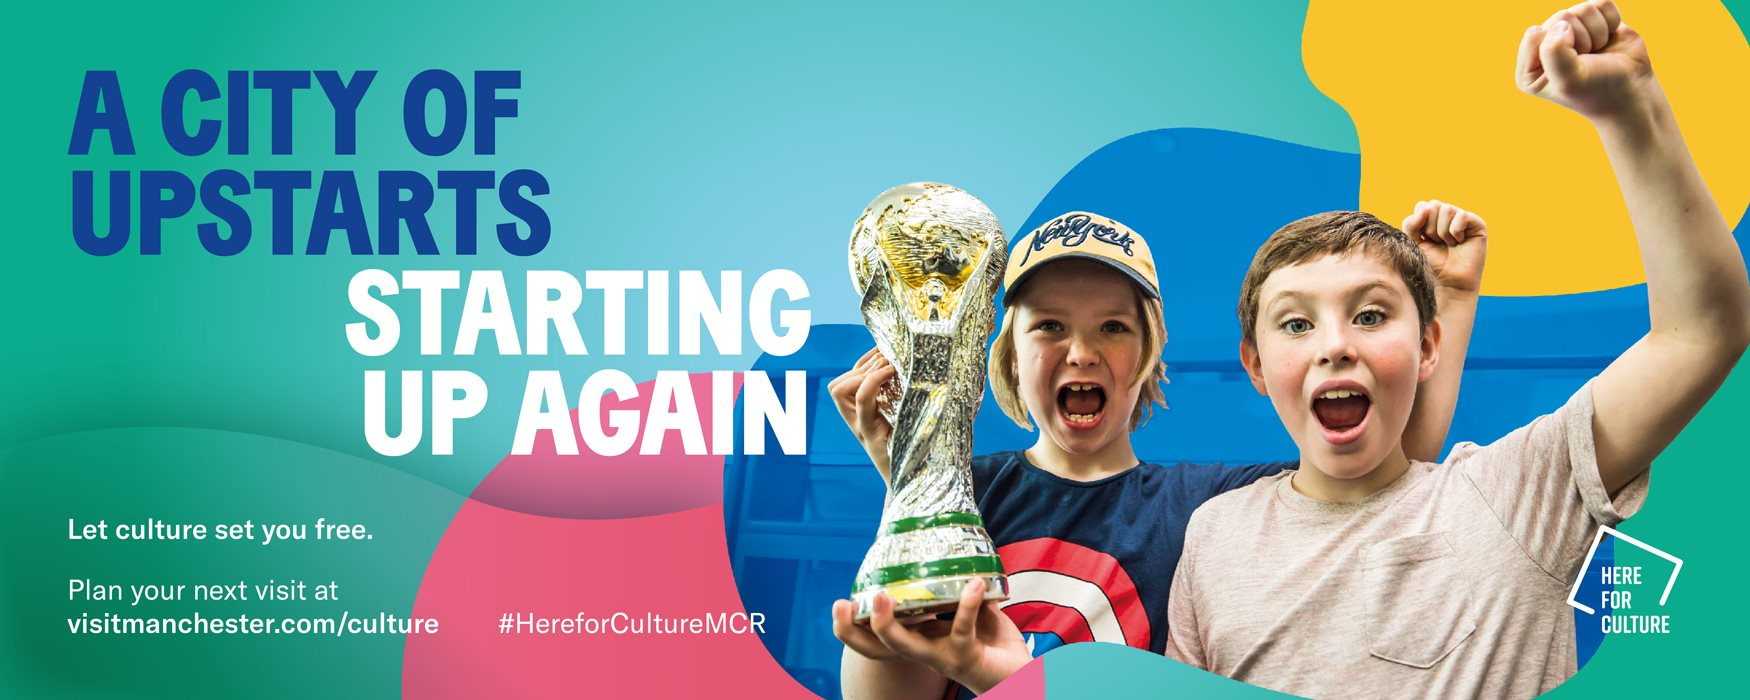 Manchester culture campaign artwork